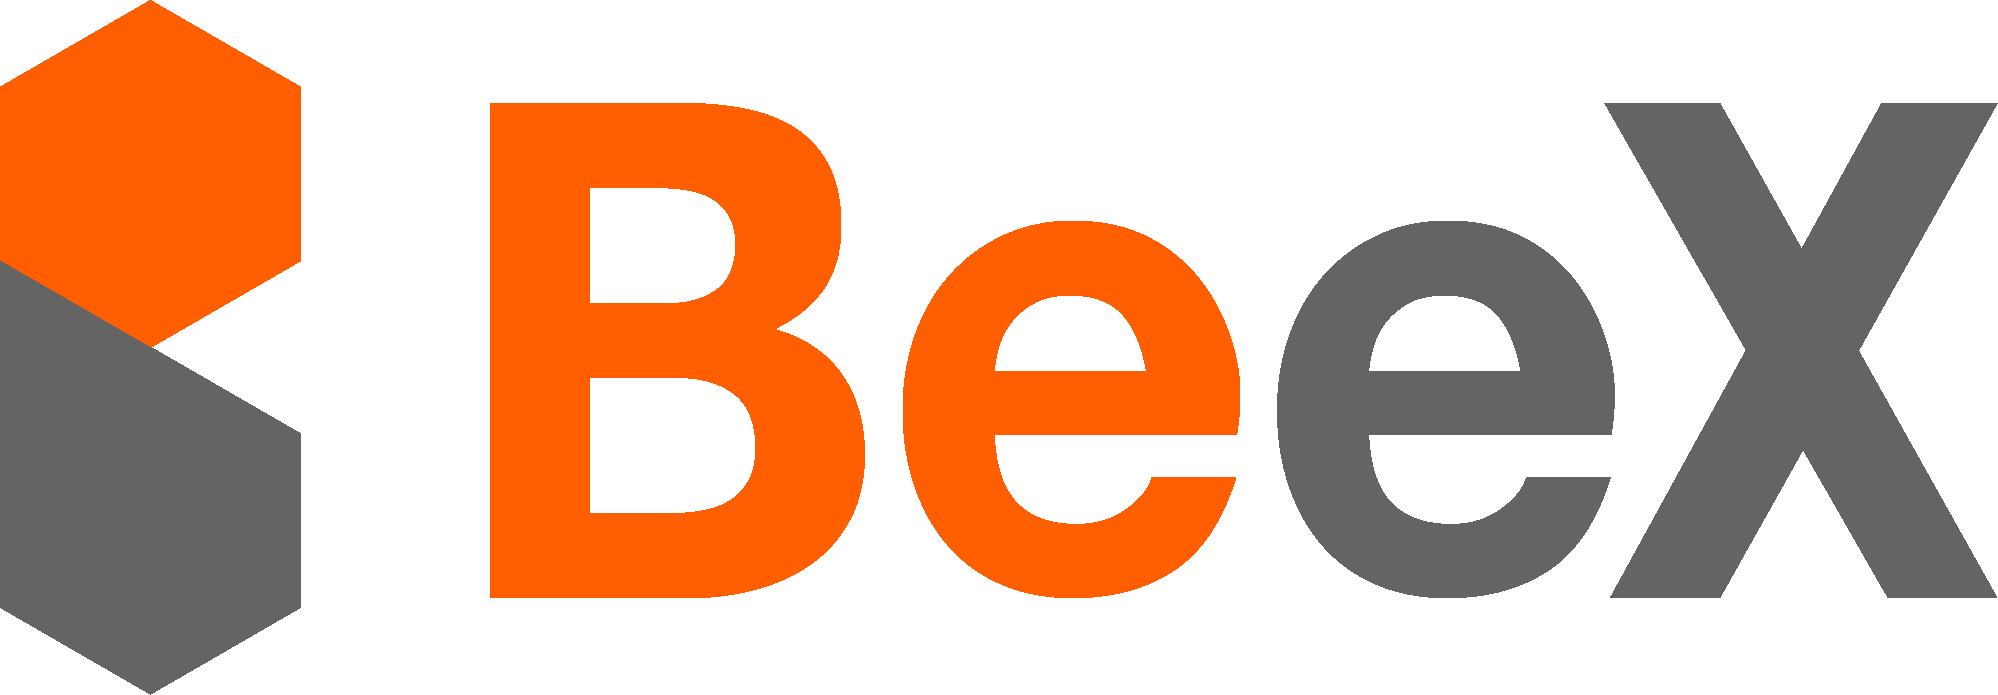 株式会社BeeX